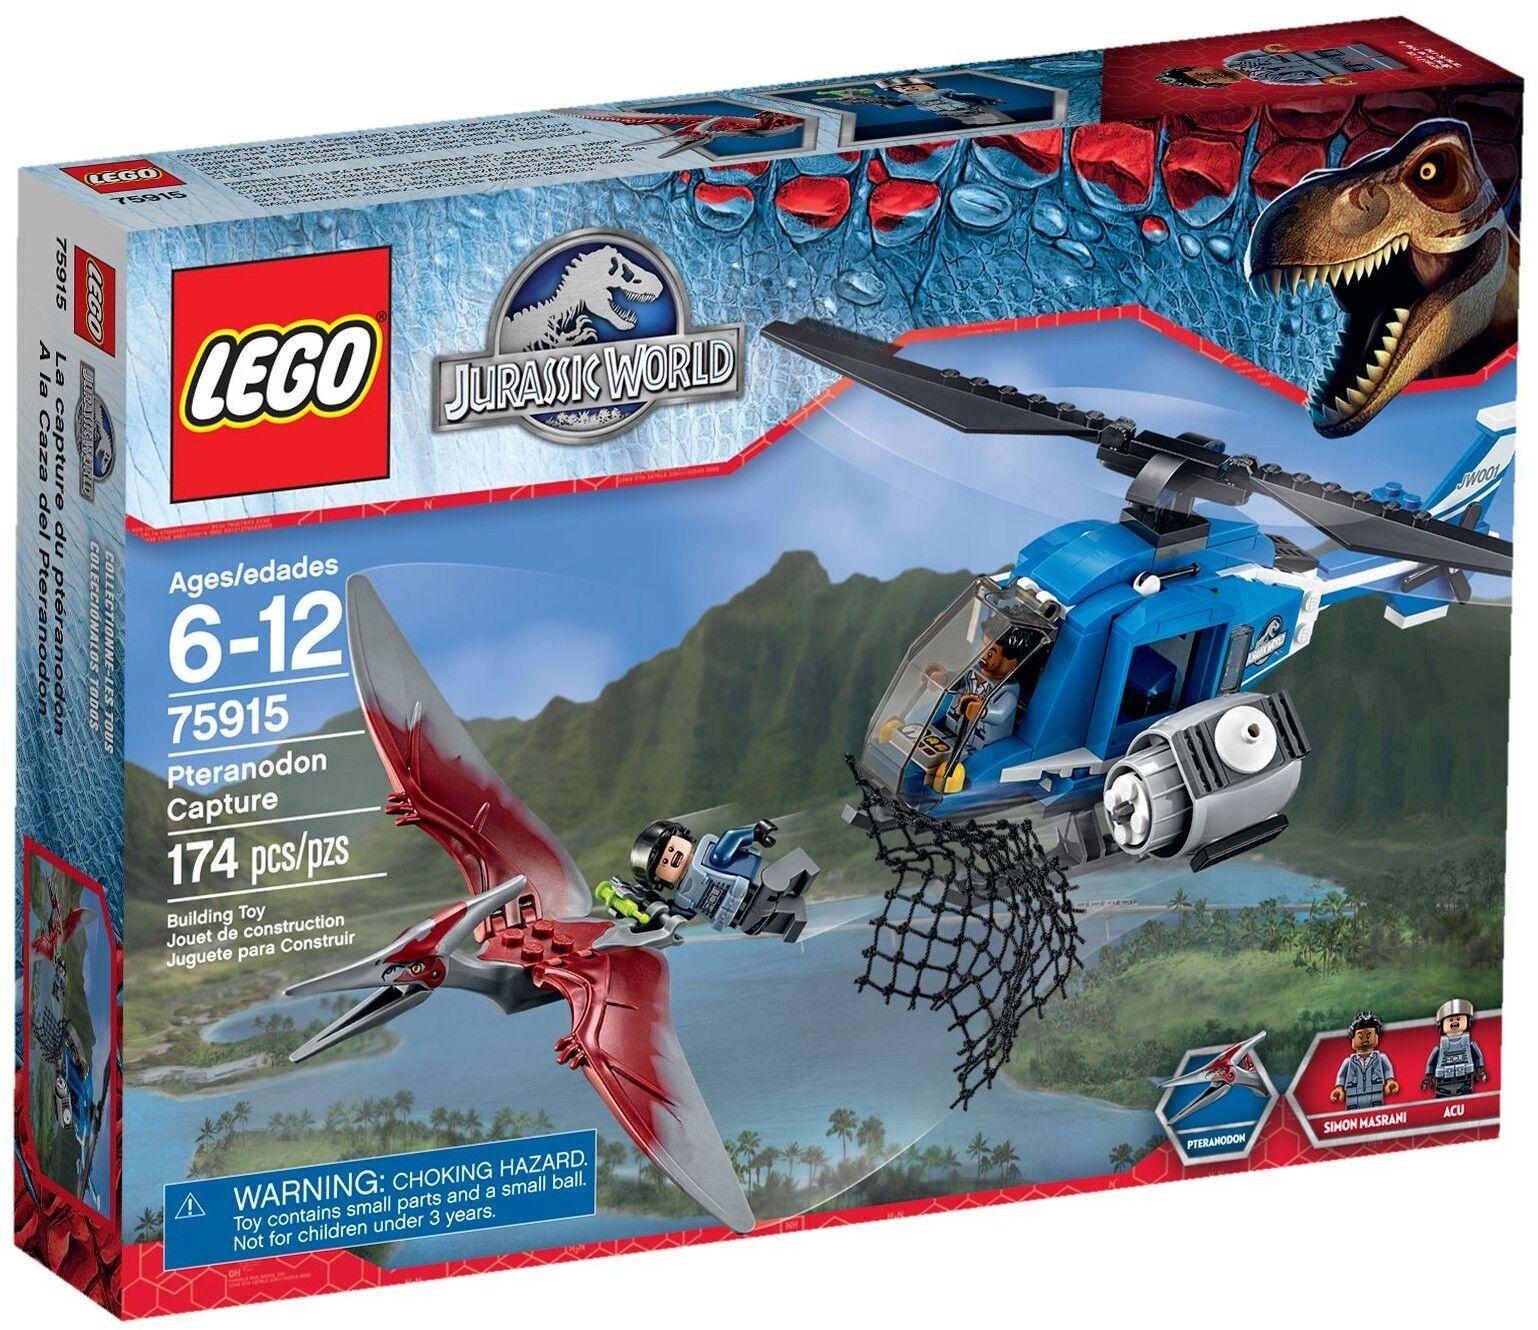 LEGO 75915 Jurassic Jurassic Jurassic World  PTERANODON CAPTURE  2 Minifigures Factory Sealed Box 6e4bd3